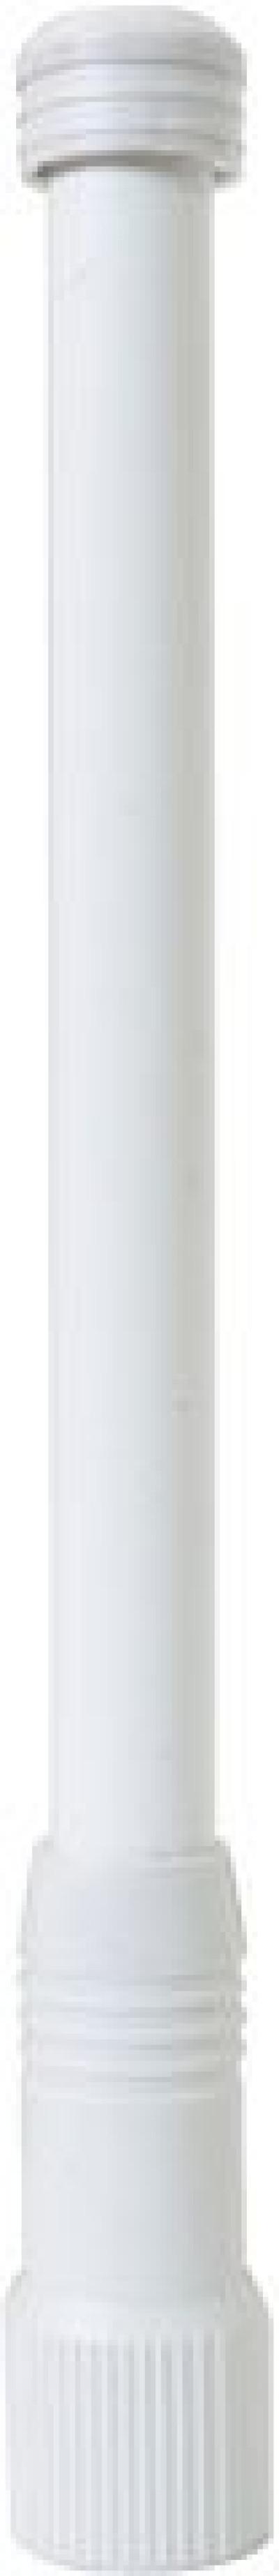 Mobile Mark, Inc. Wireless Antenna Wireless Antenna